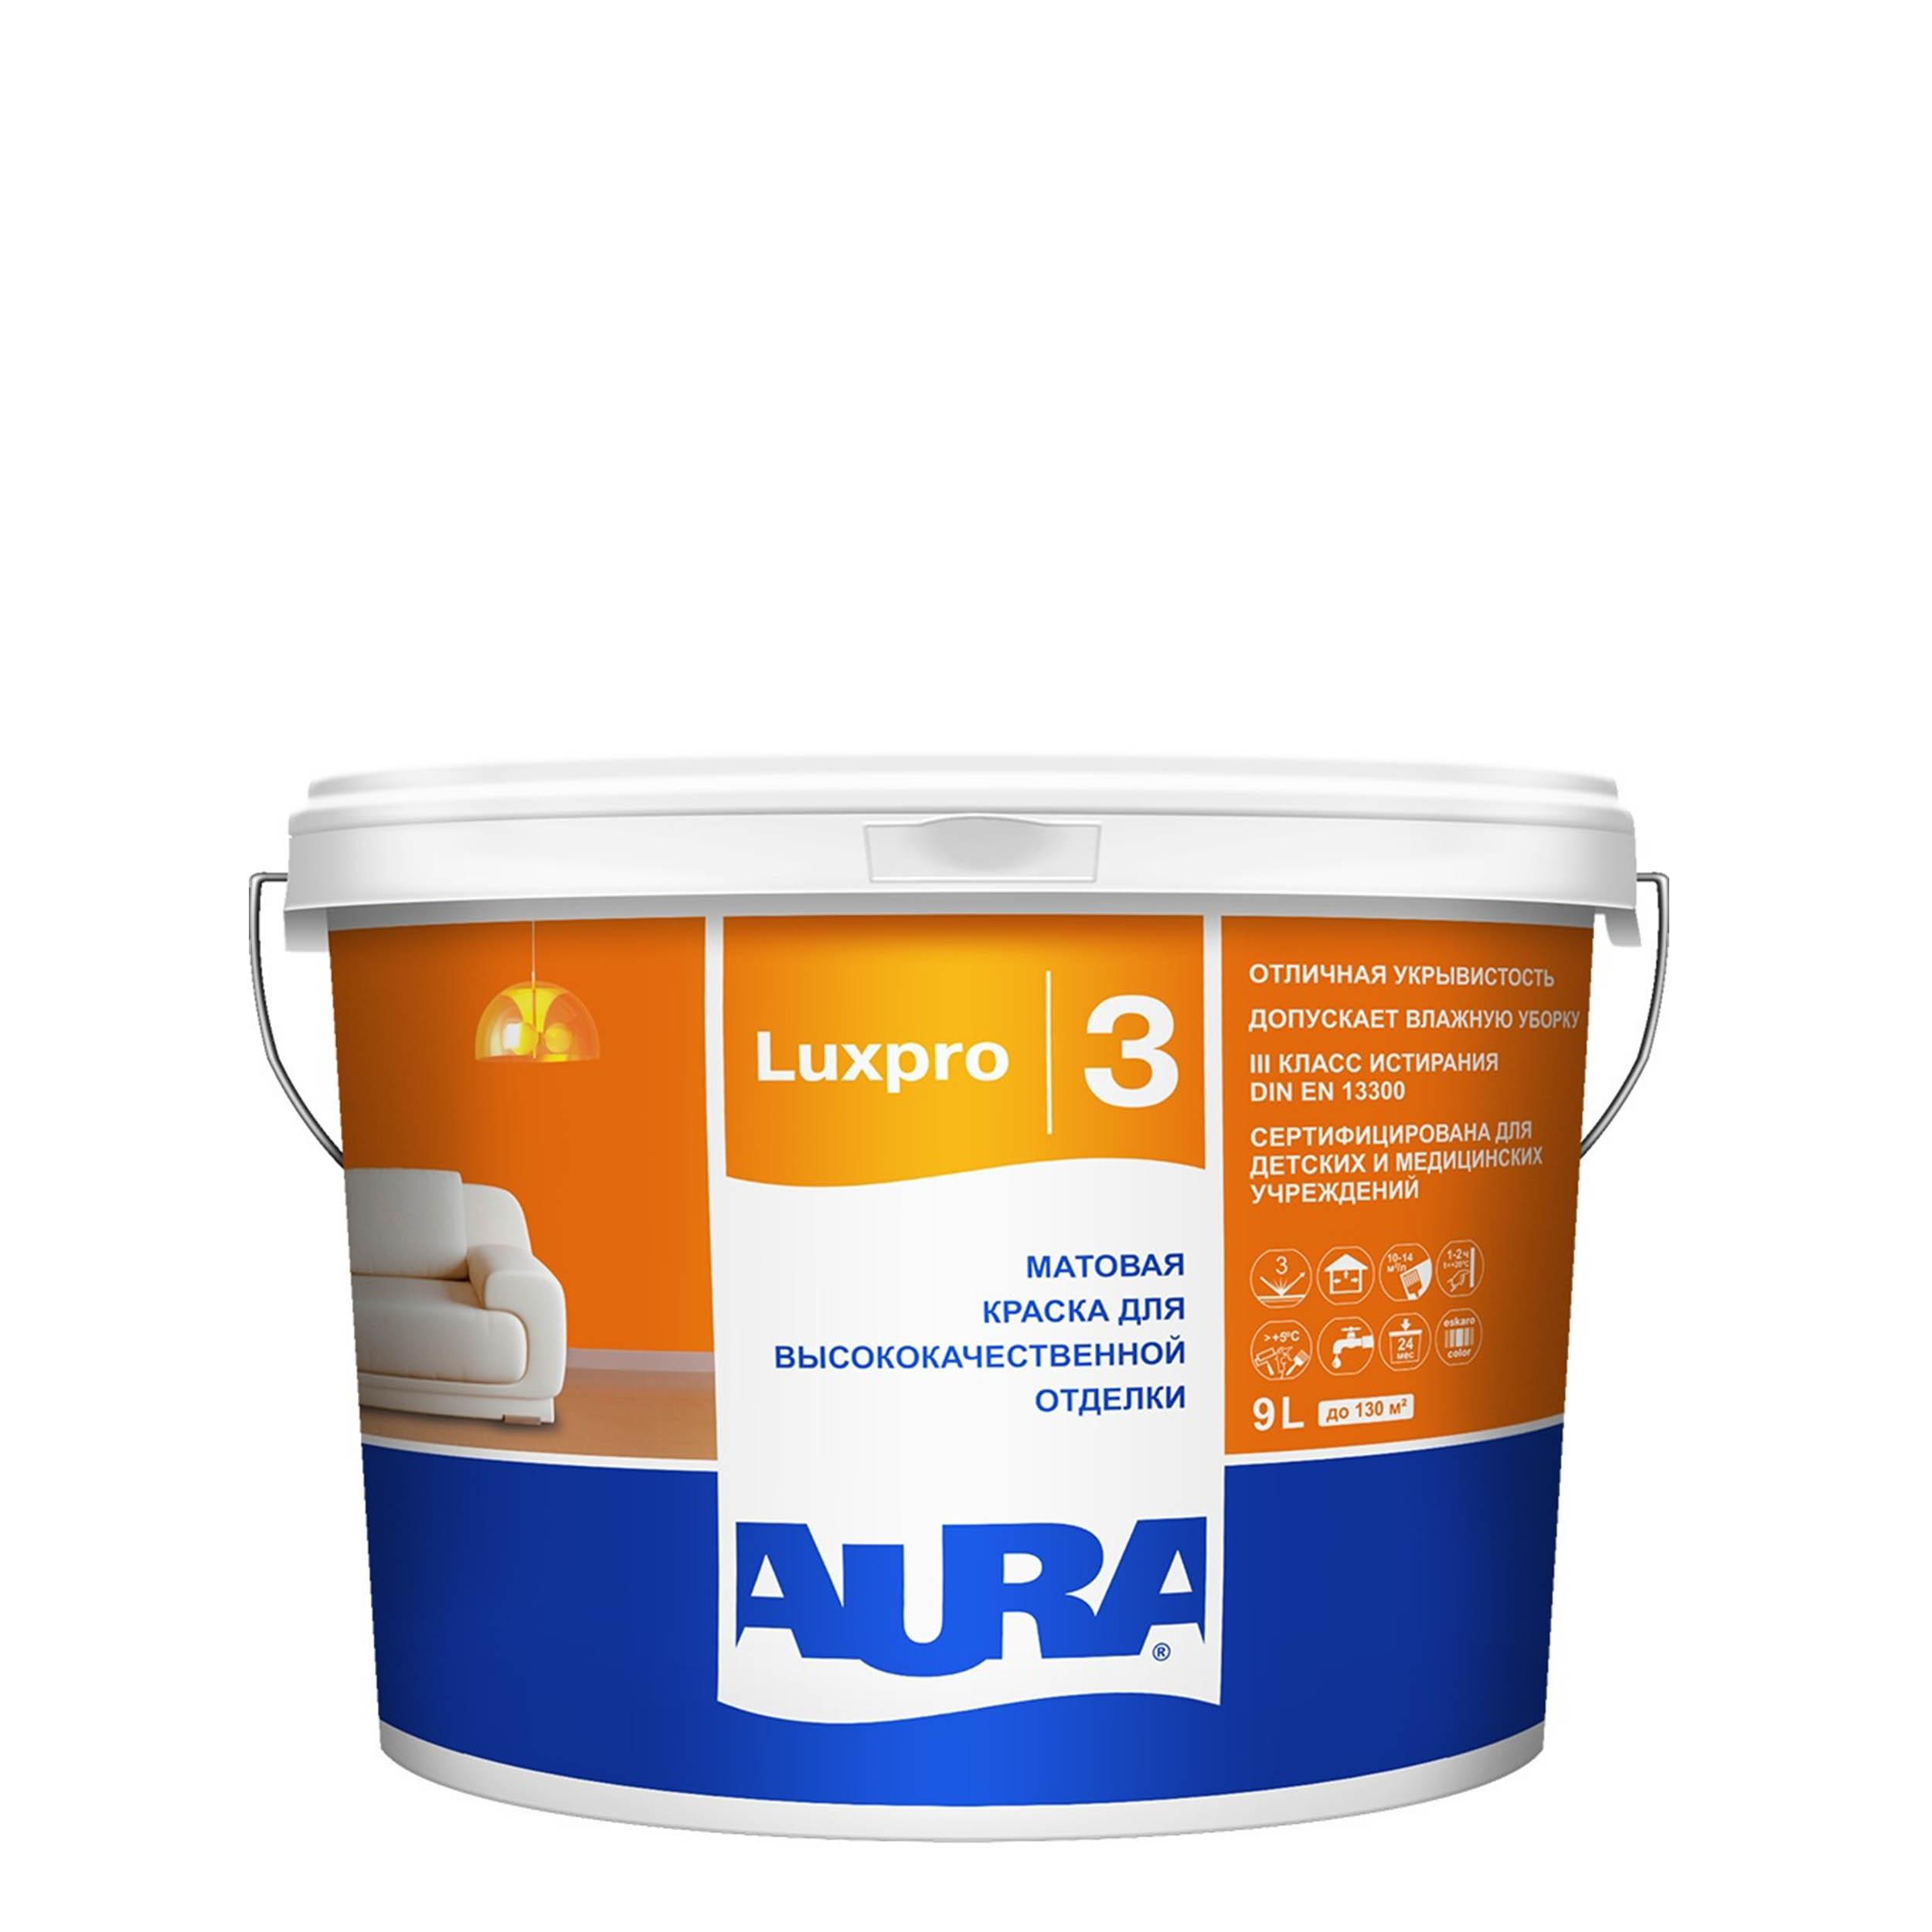 Фото 18 - Краска интерьерная, Aura LuxPRO 3, RAL 1020, 11 кг.